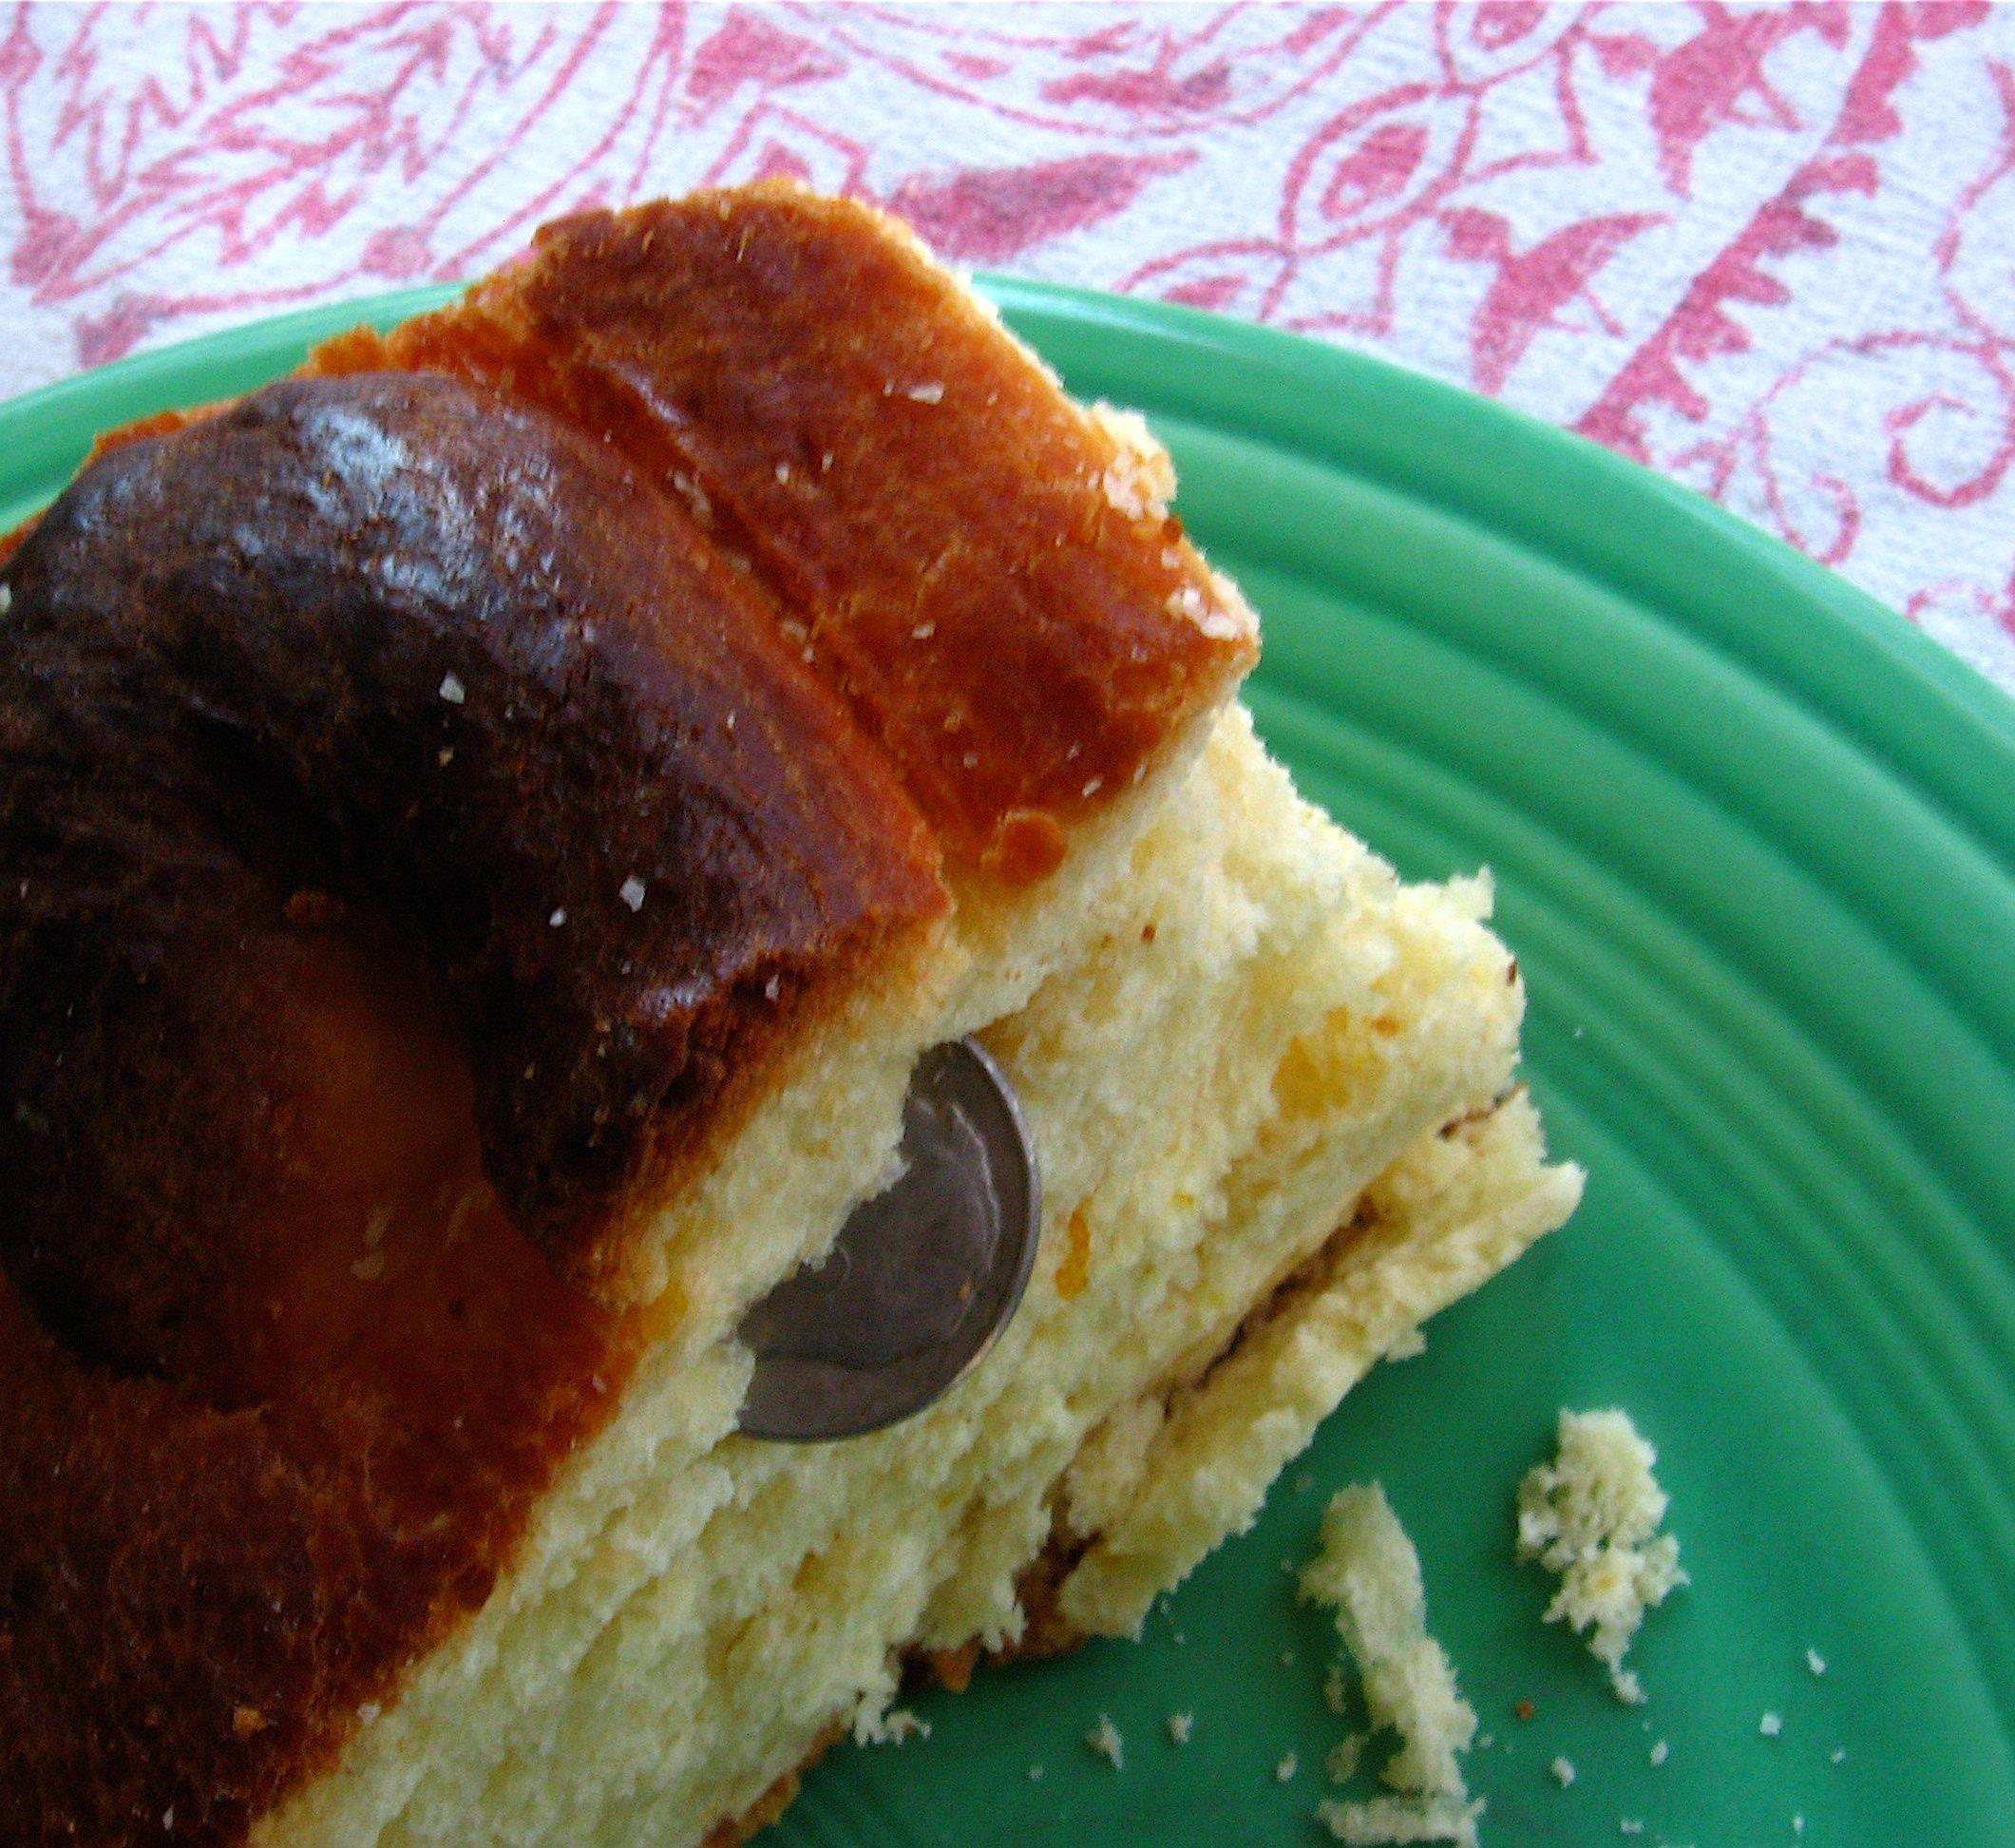 Party Like The Greeks This New Year By Making Vasilopita Recipe Greek Pastries Greek Cake New Year S Cake